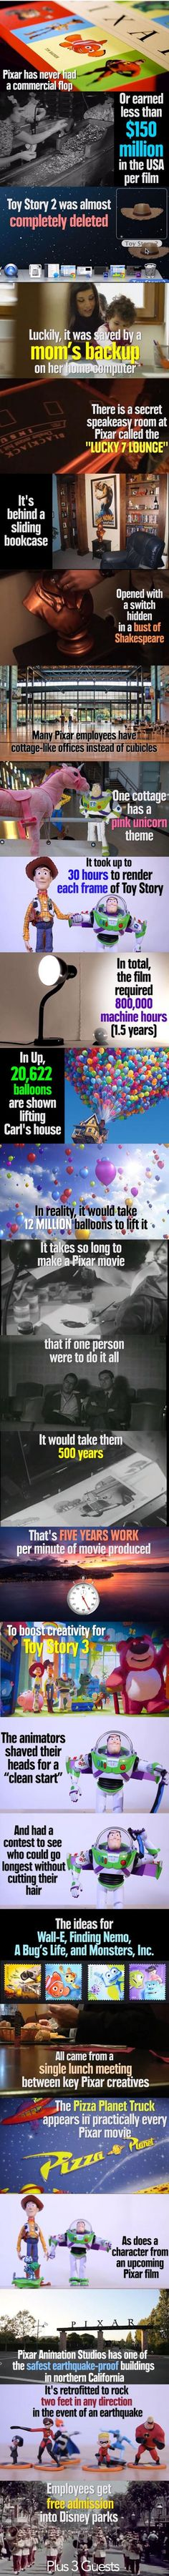 Facts about Pixar. Disney<3